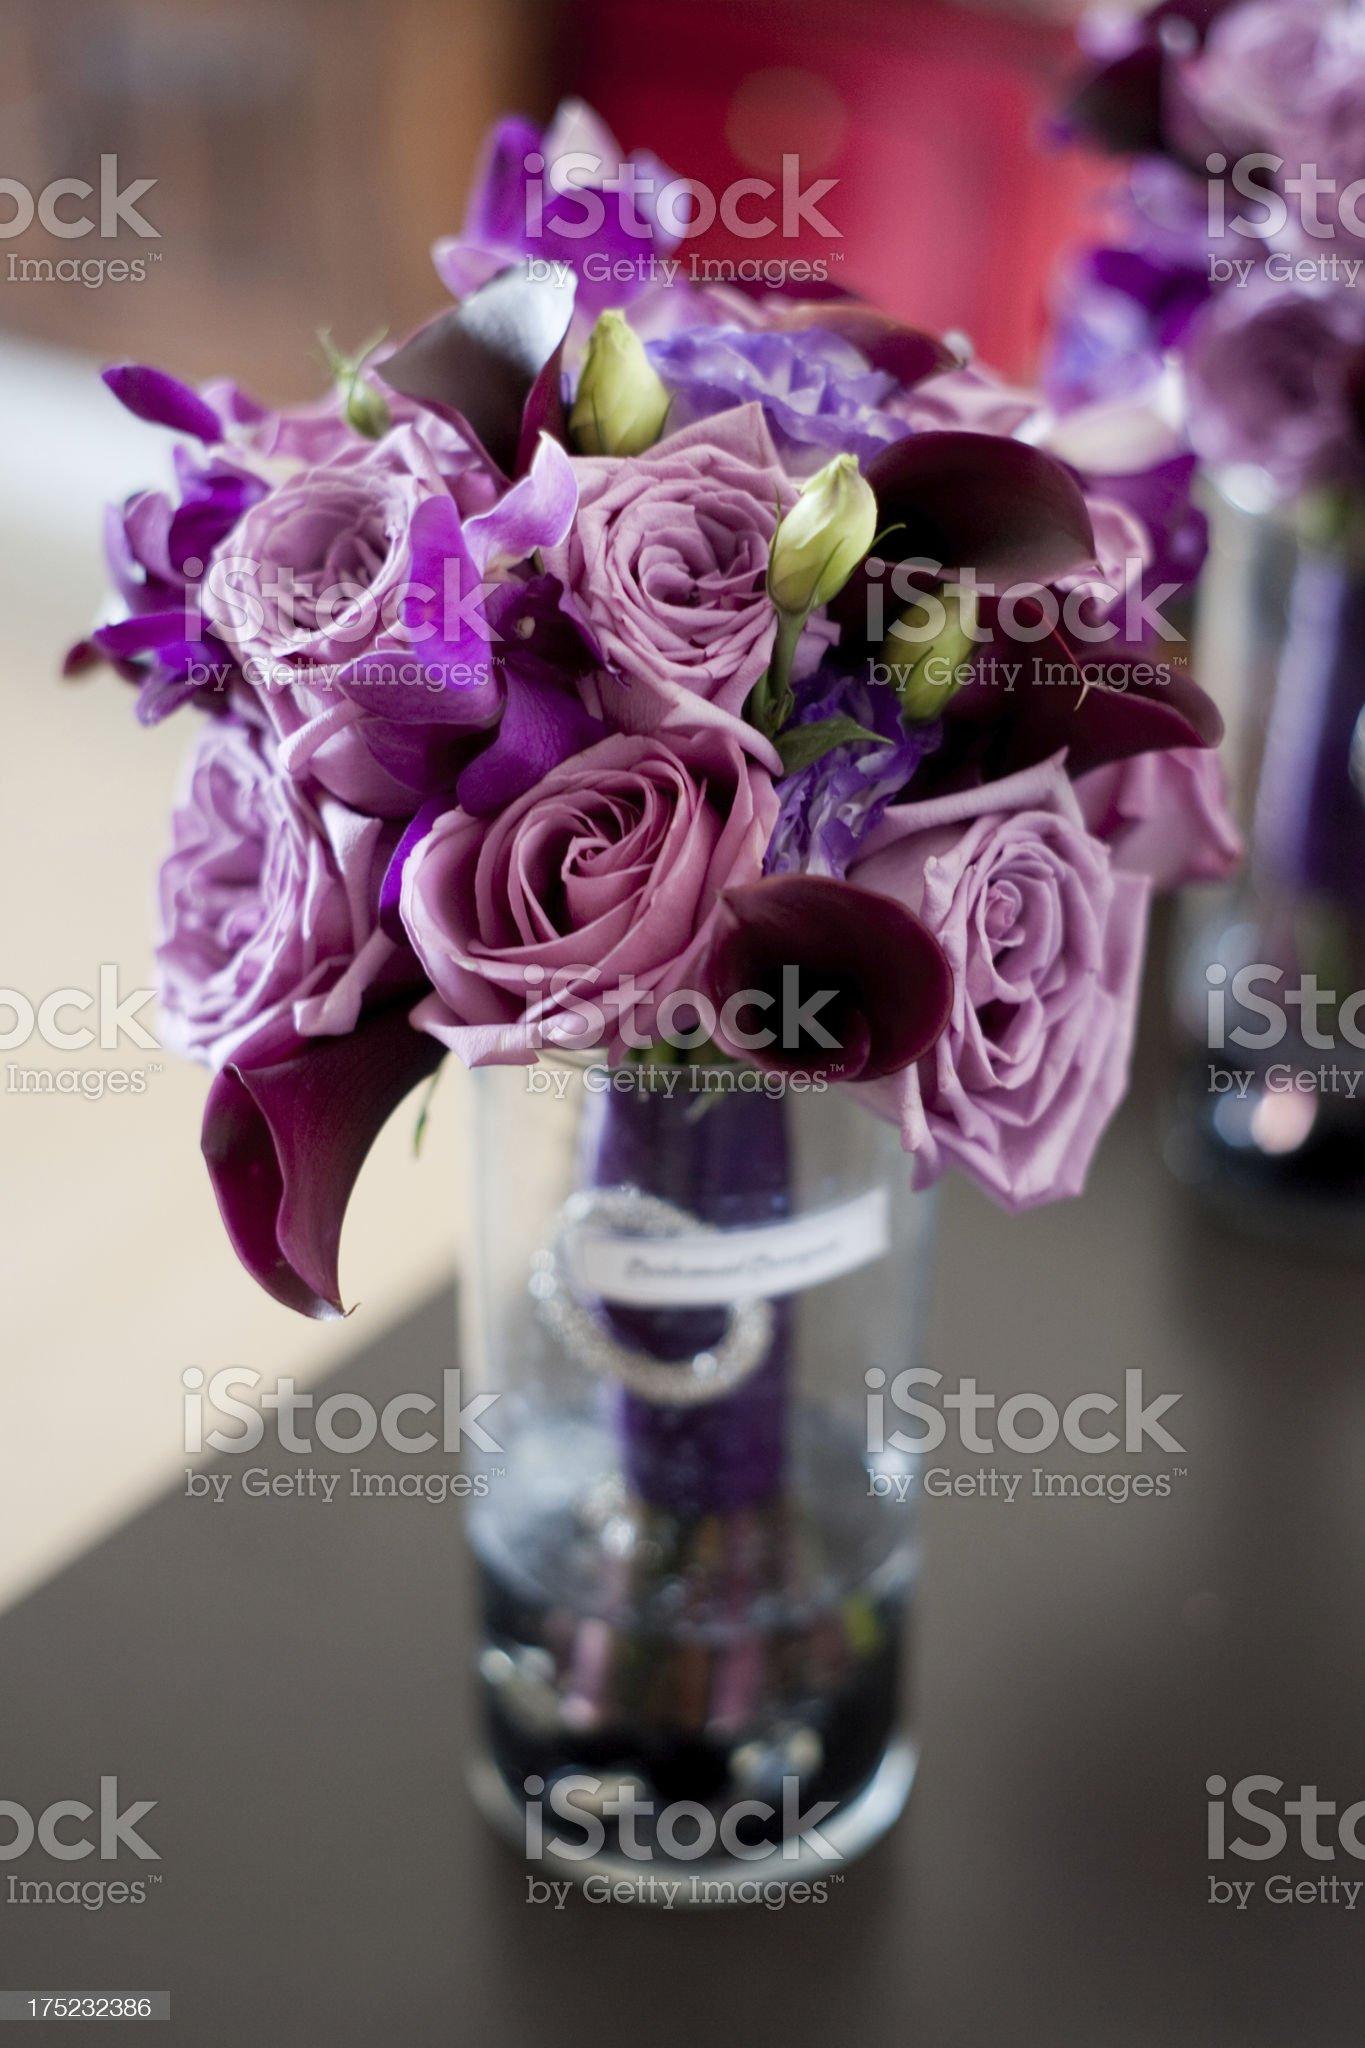 Beautiful Floral Arrangement Bridal Bouquet of Purple Flowers royalty-free stock photo